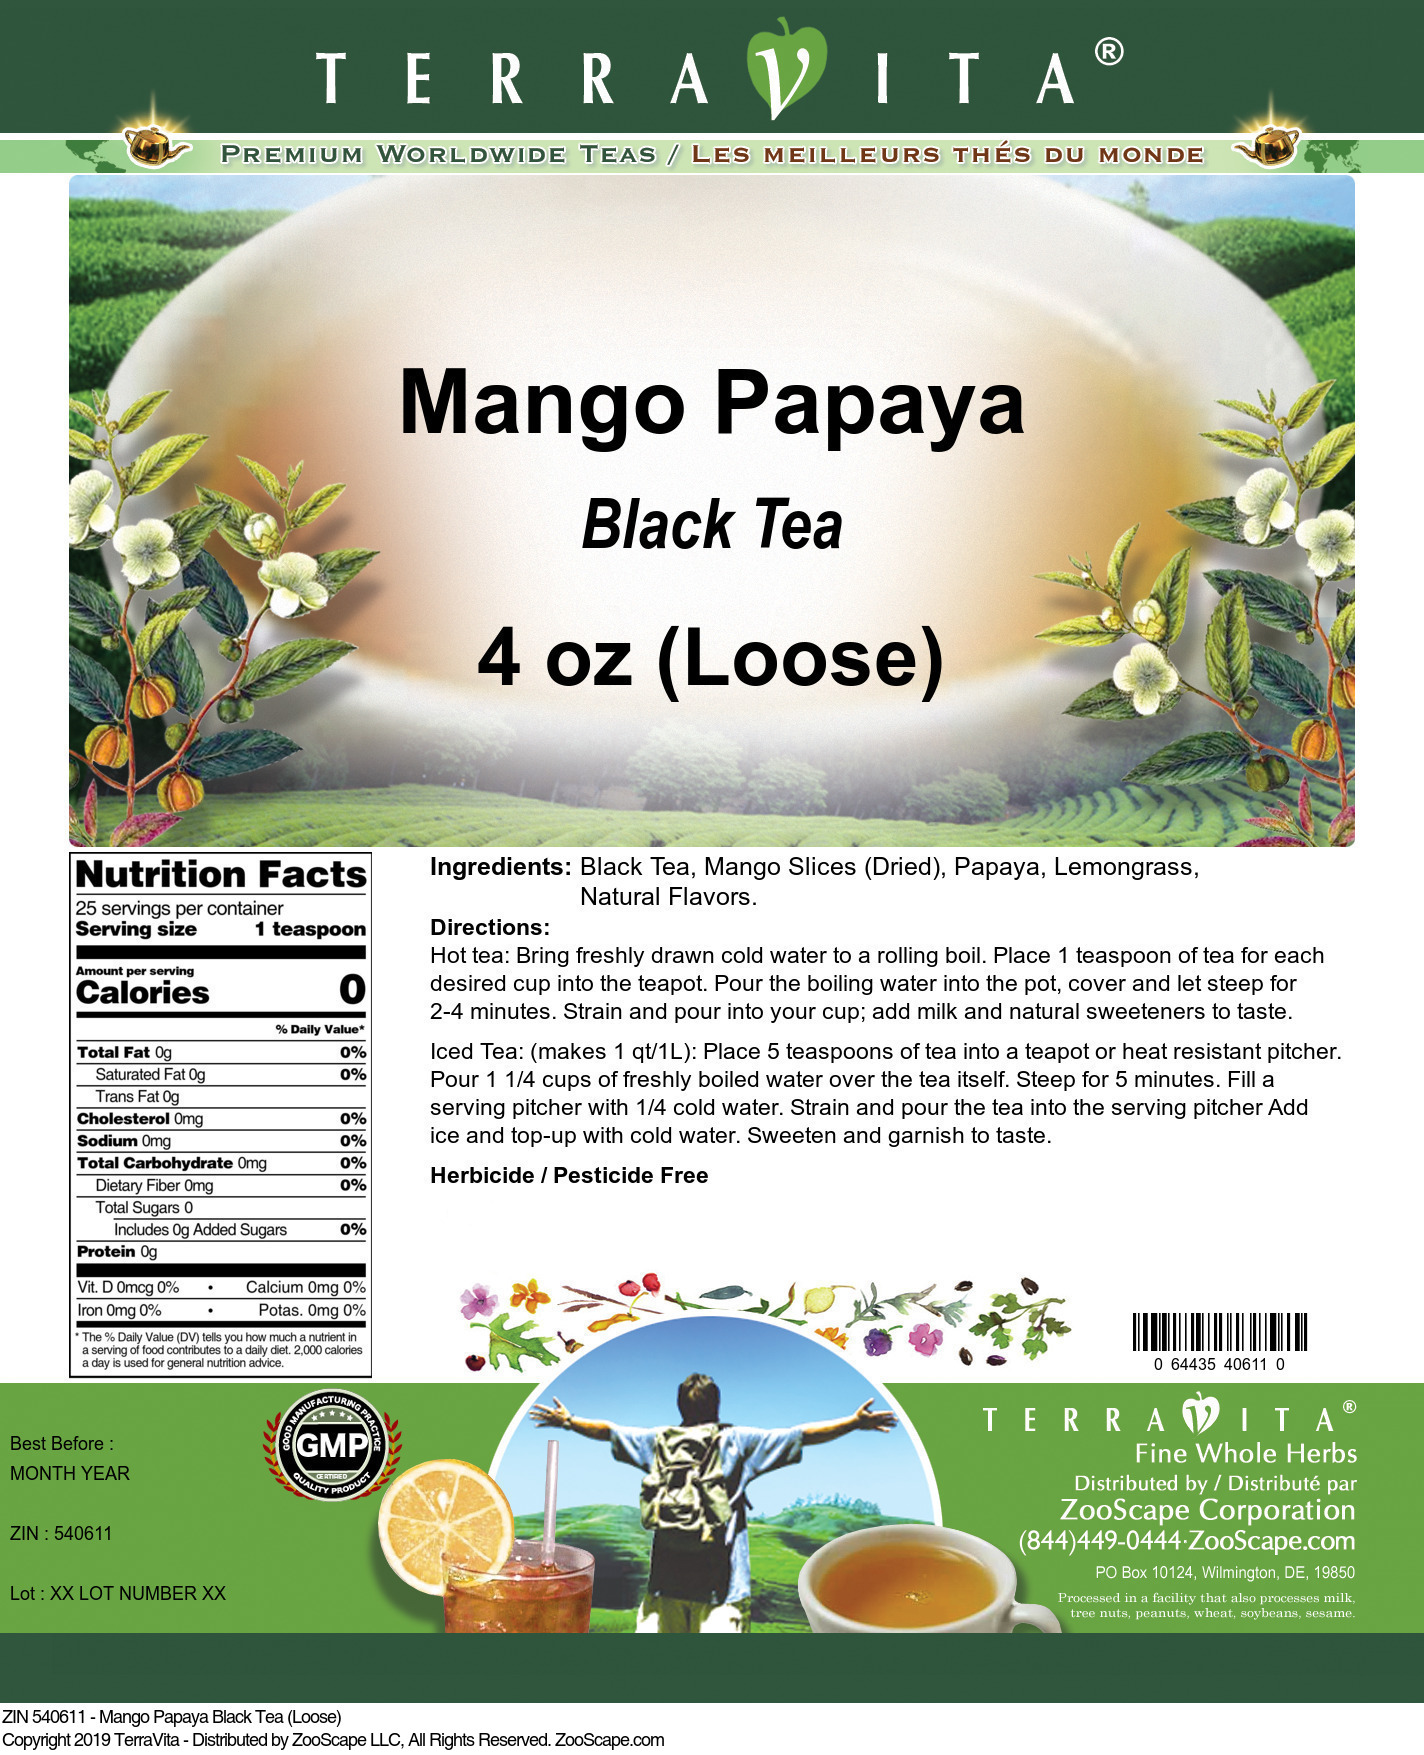 Mango Papaya Black Tea